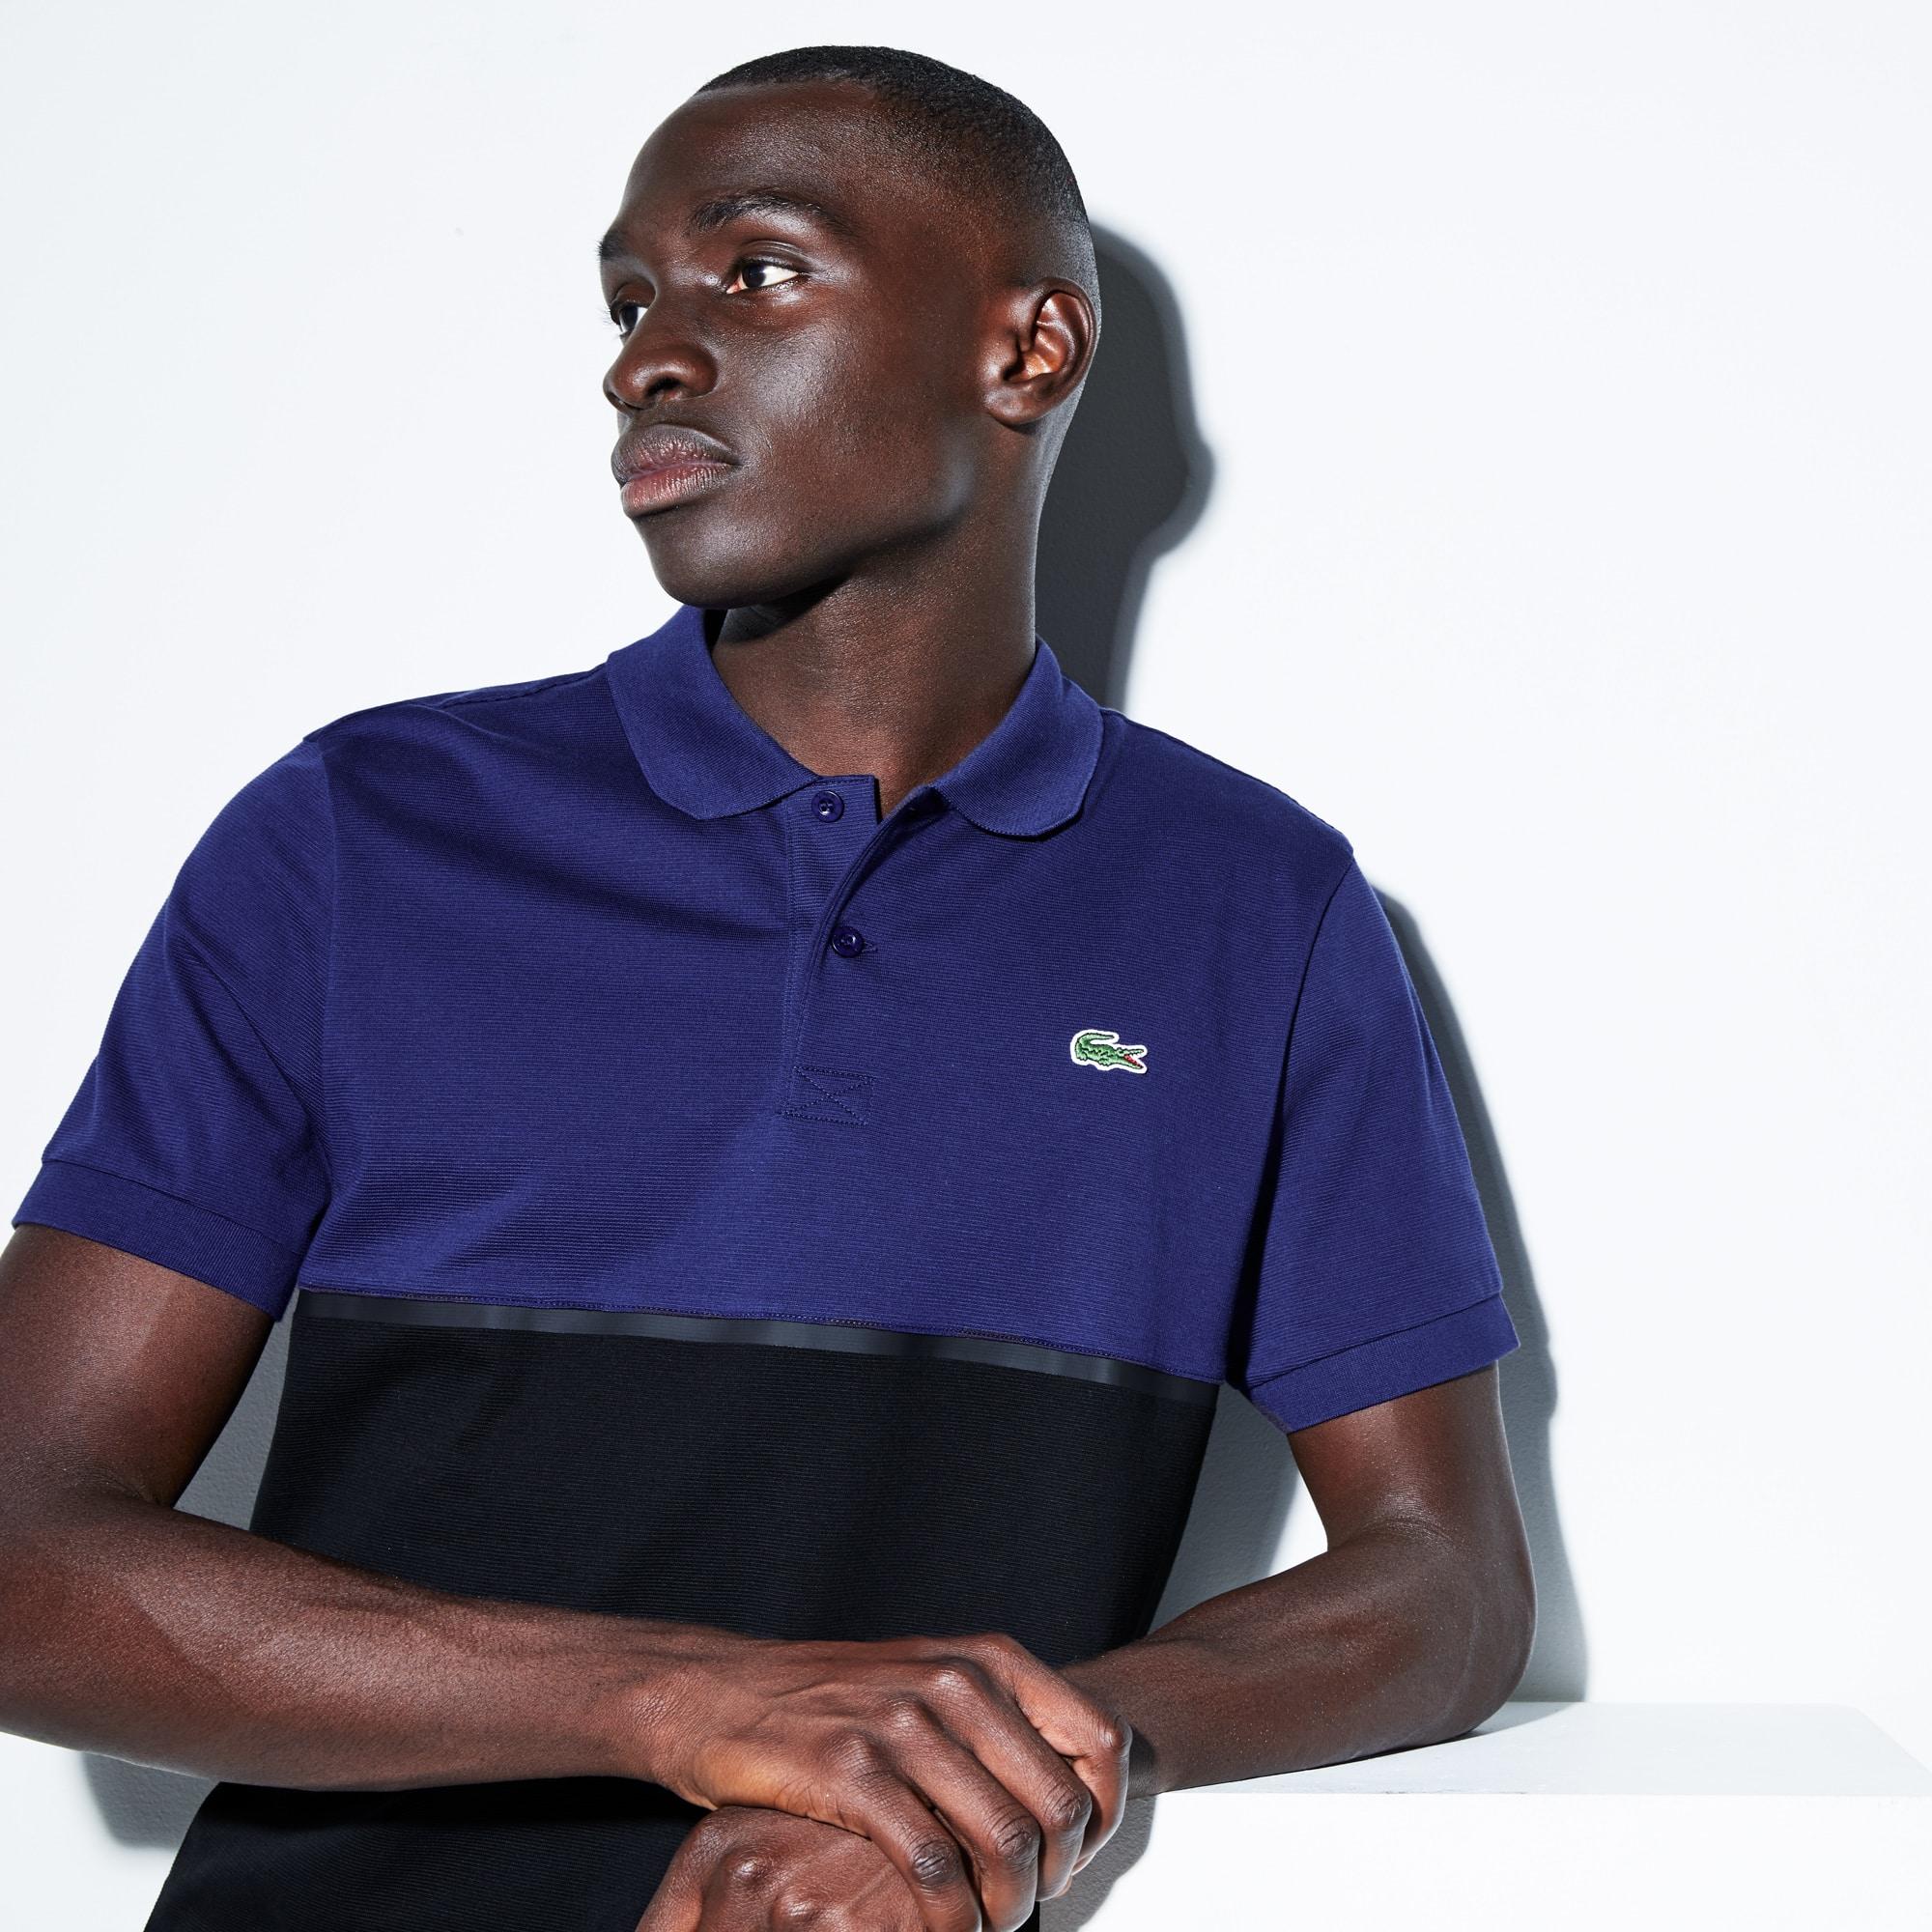 Men's SPORT Colorblock Ultra-Light Cotton Tennis Polo